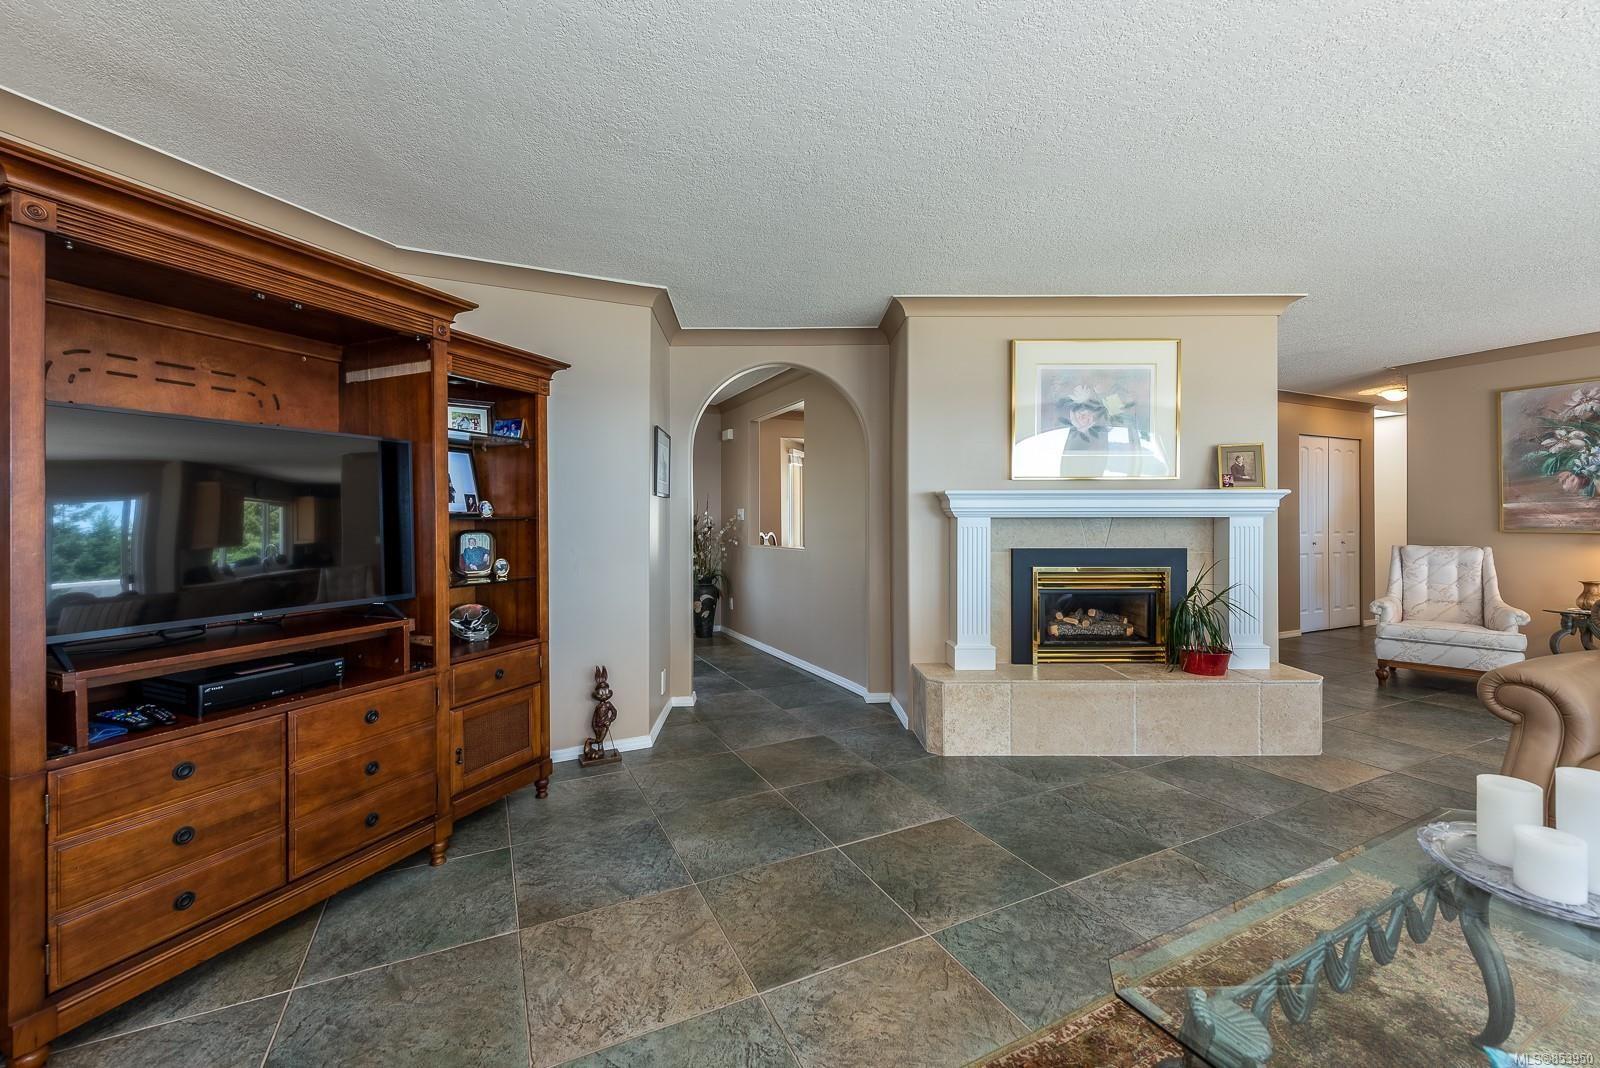 Photo 18: Photos: 5880 GARVIN Rd in : CV Union Bay/Fanny Bay House for sale (Comox Valley)  : MLS®# 853950